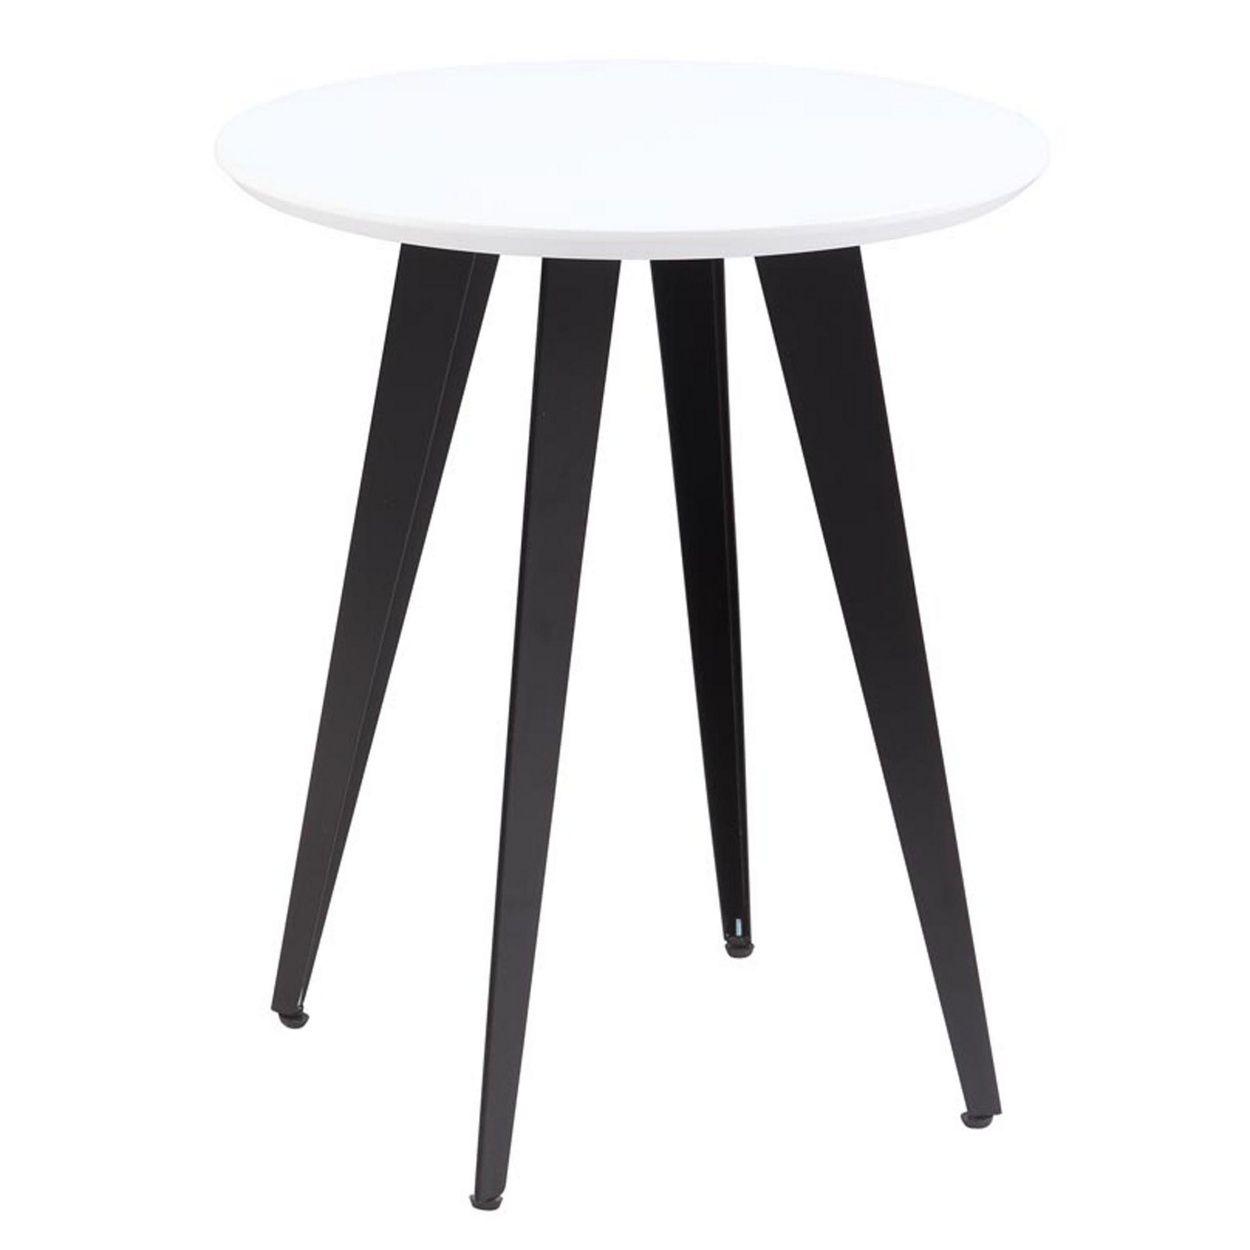 Ben de lisi home white sorbet side table at debenhams ben de lisi home white sorbet side table at debenhams geotapseo Images